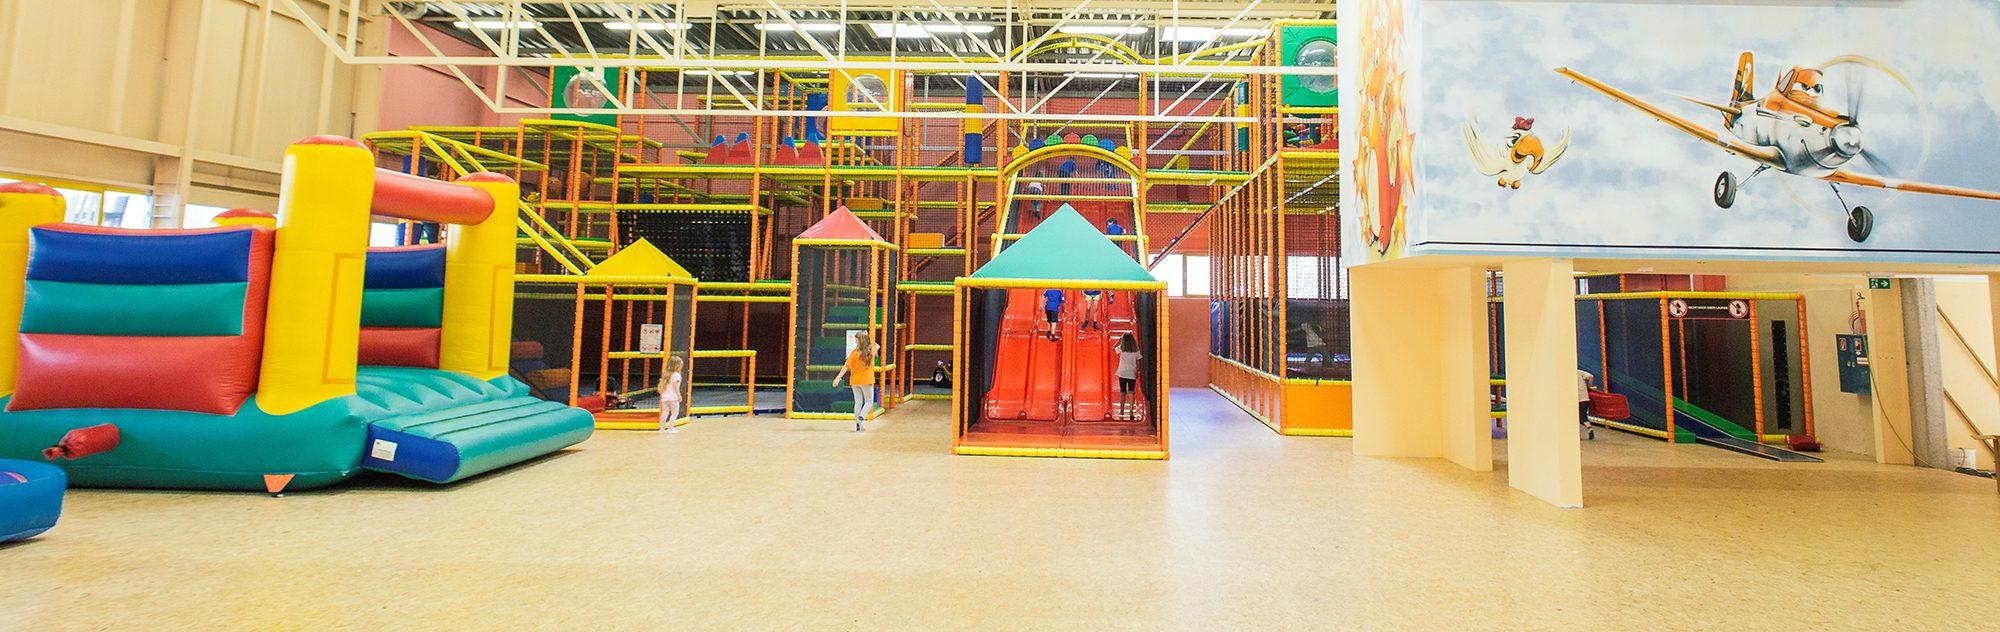 Joy - Das Kinderparadies - Indoorspielplatz / Foto: click & smile